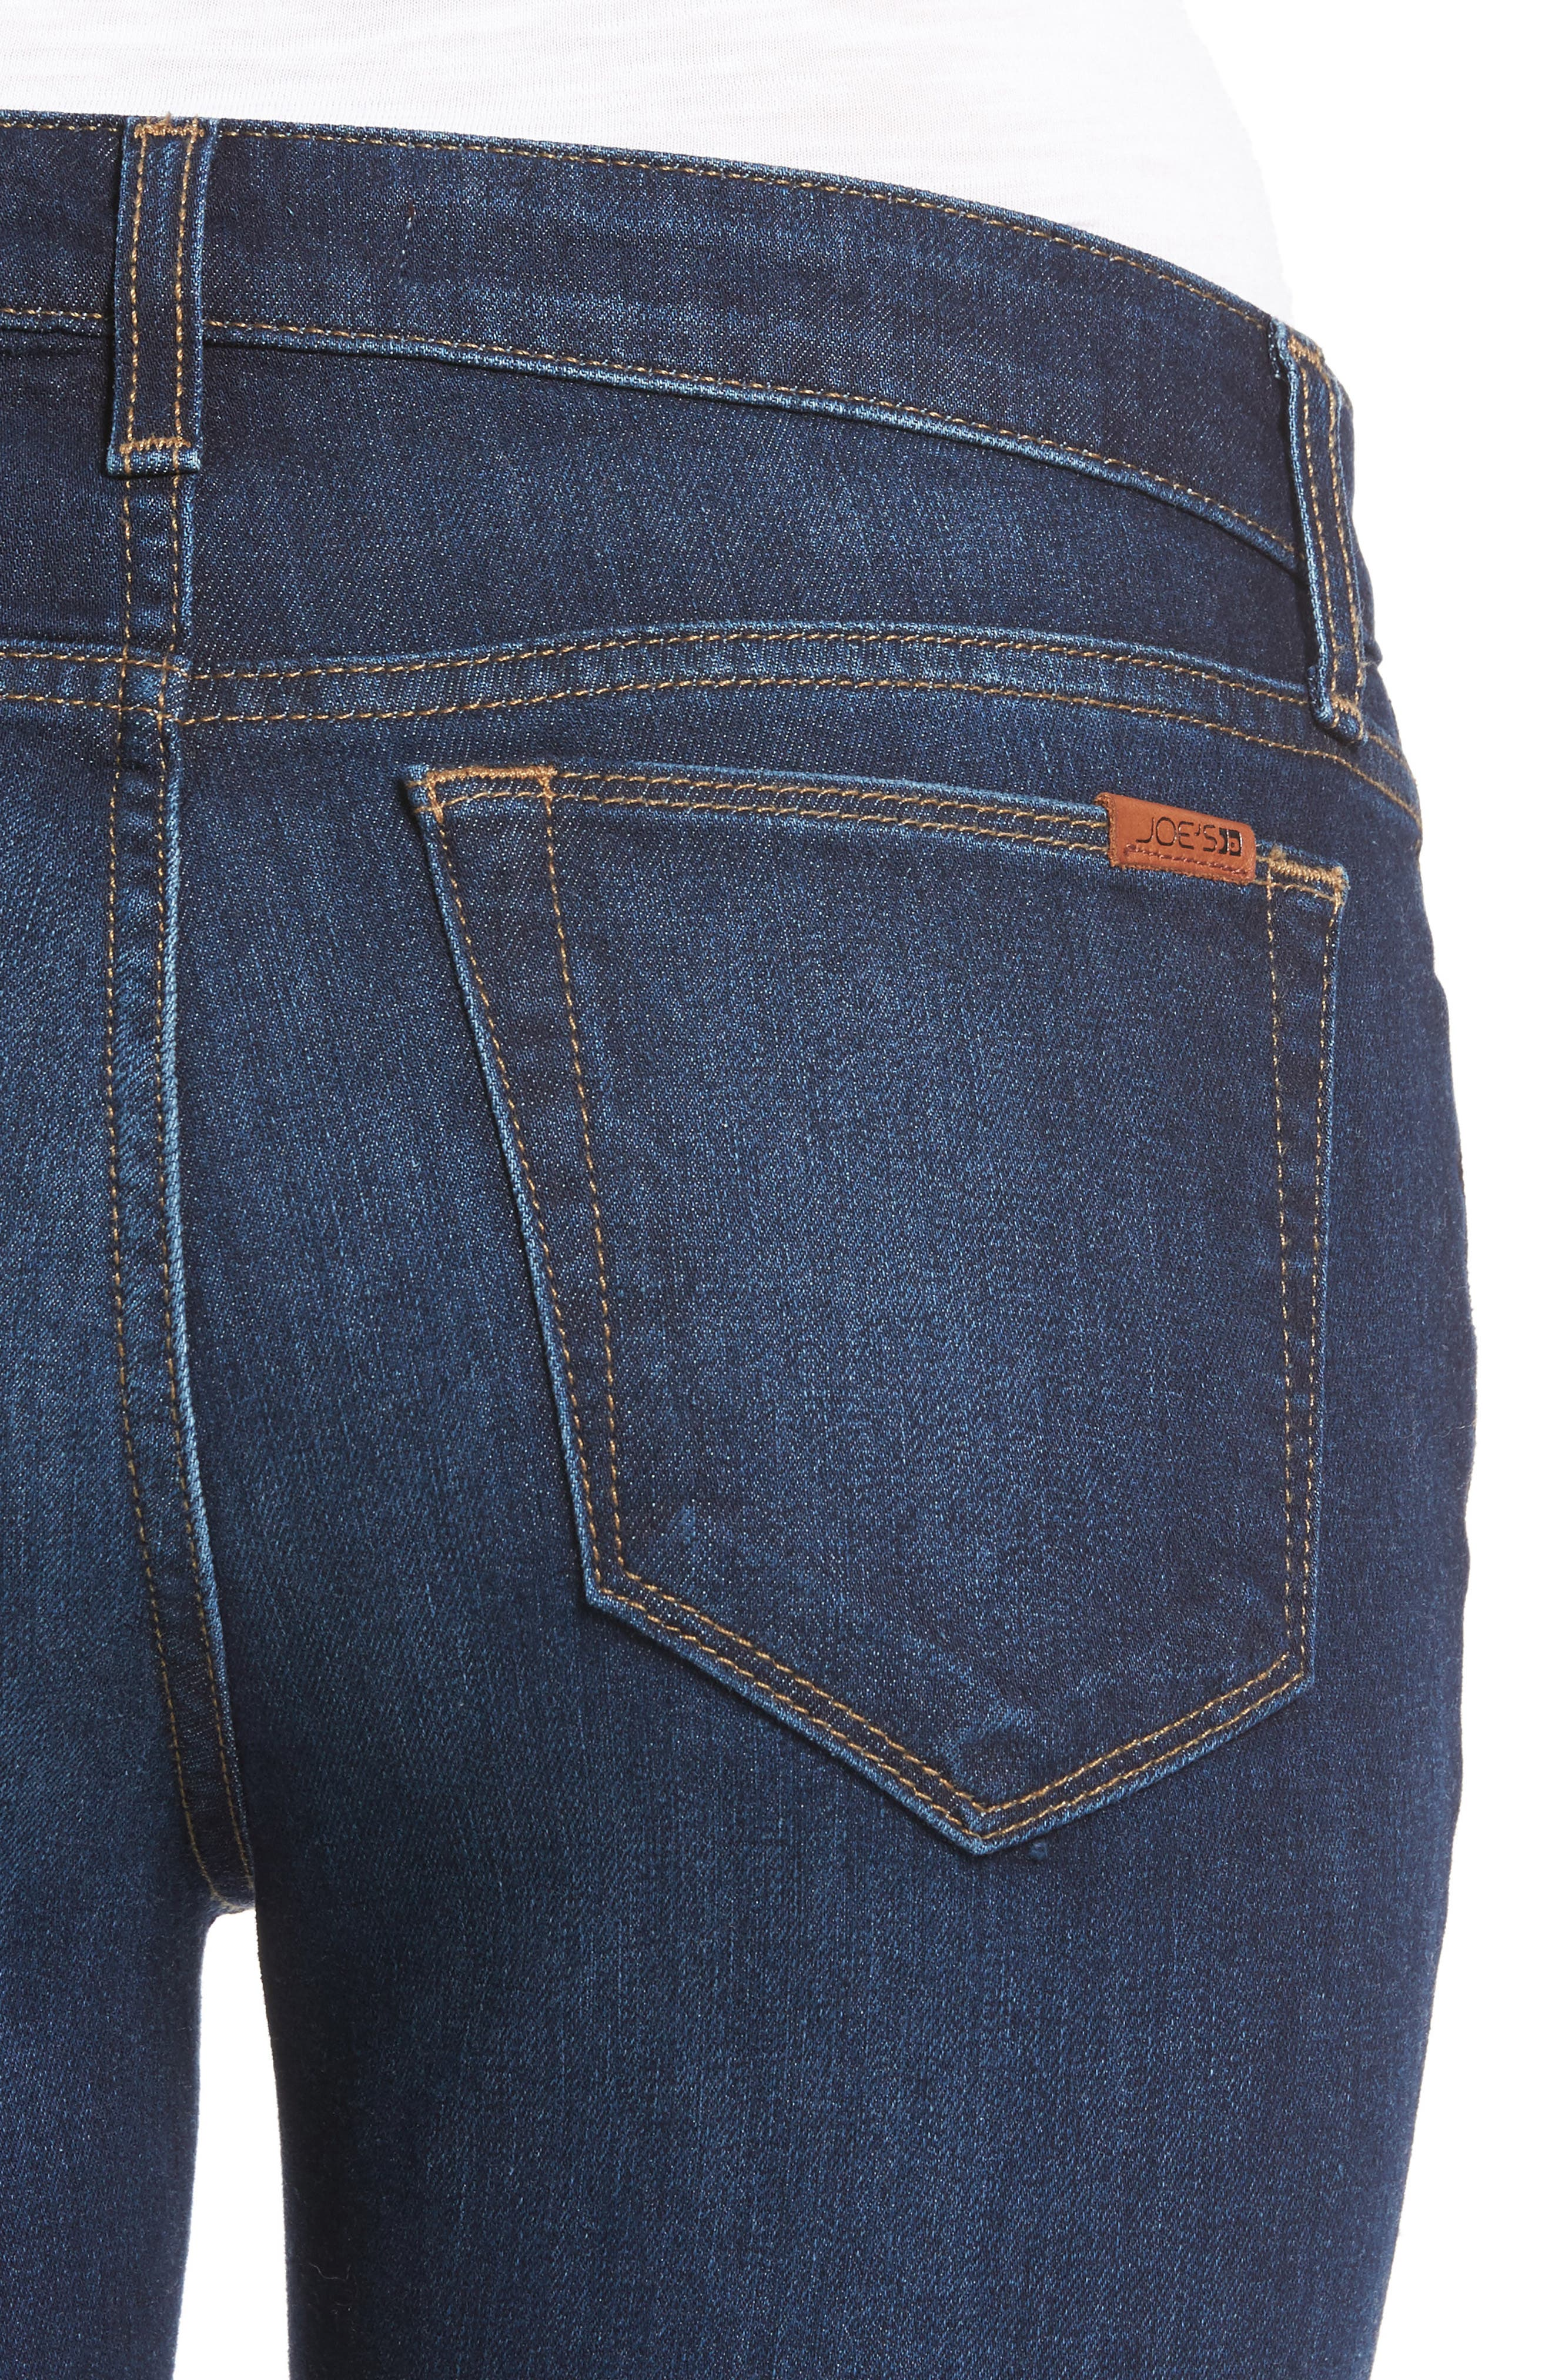 Icon Ankle Raw Hem Skinny Jeans,                             Alternate thumbnail 4, color,                             400